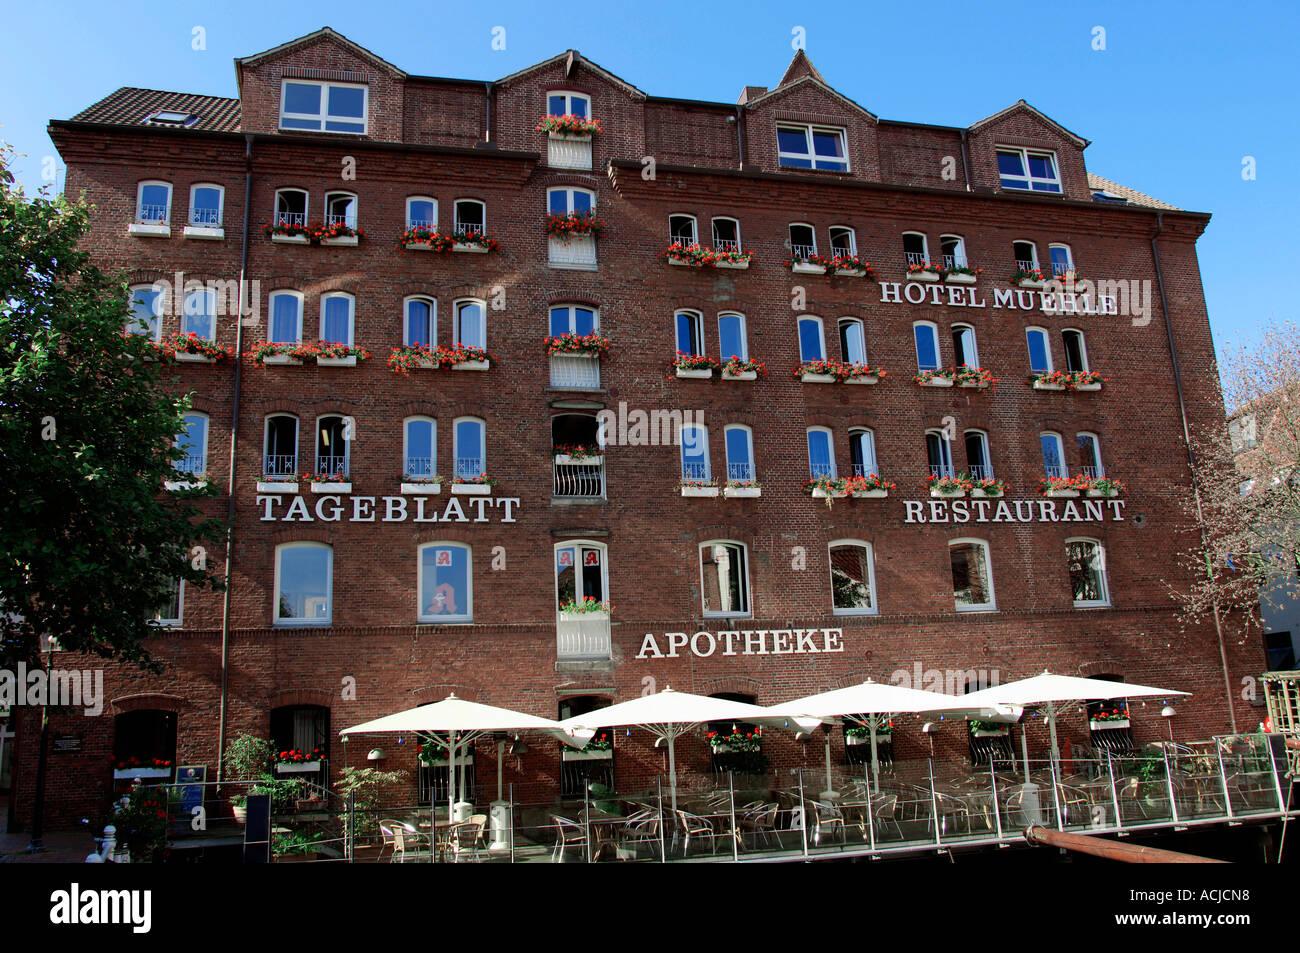 Hotel zur Muehle Buxtehude - Stock Image